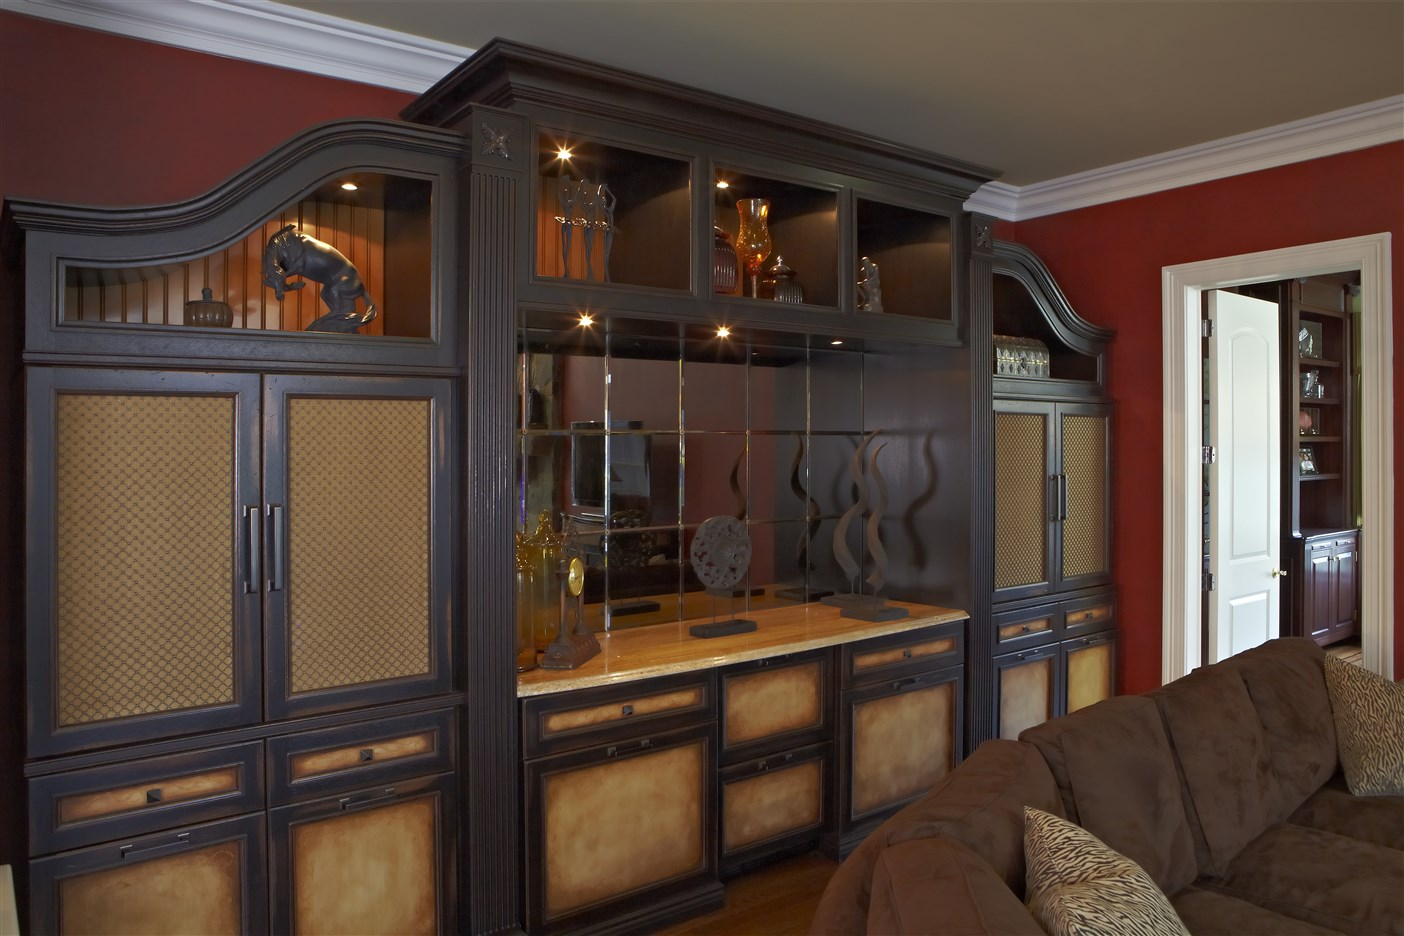 Large brown wooden shelves